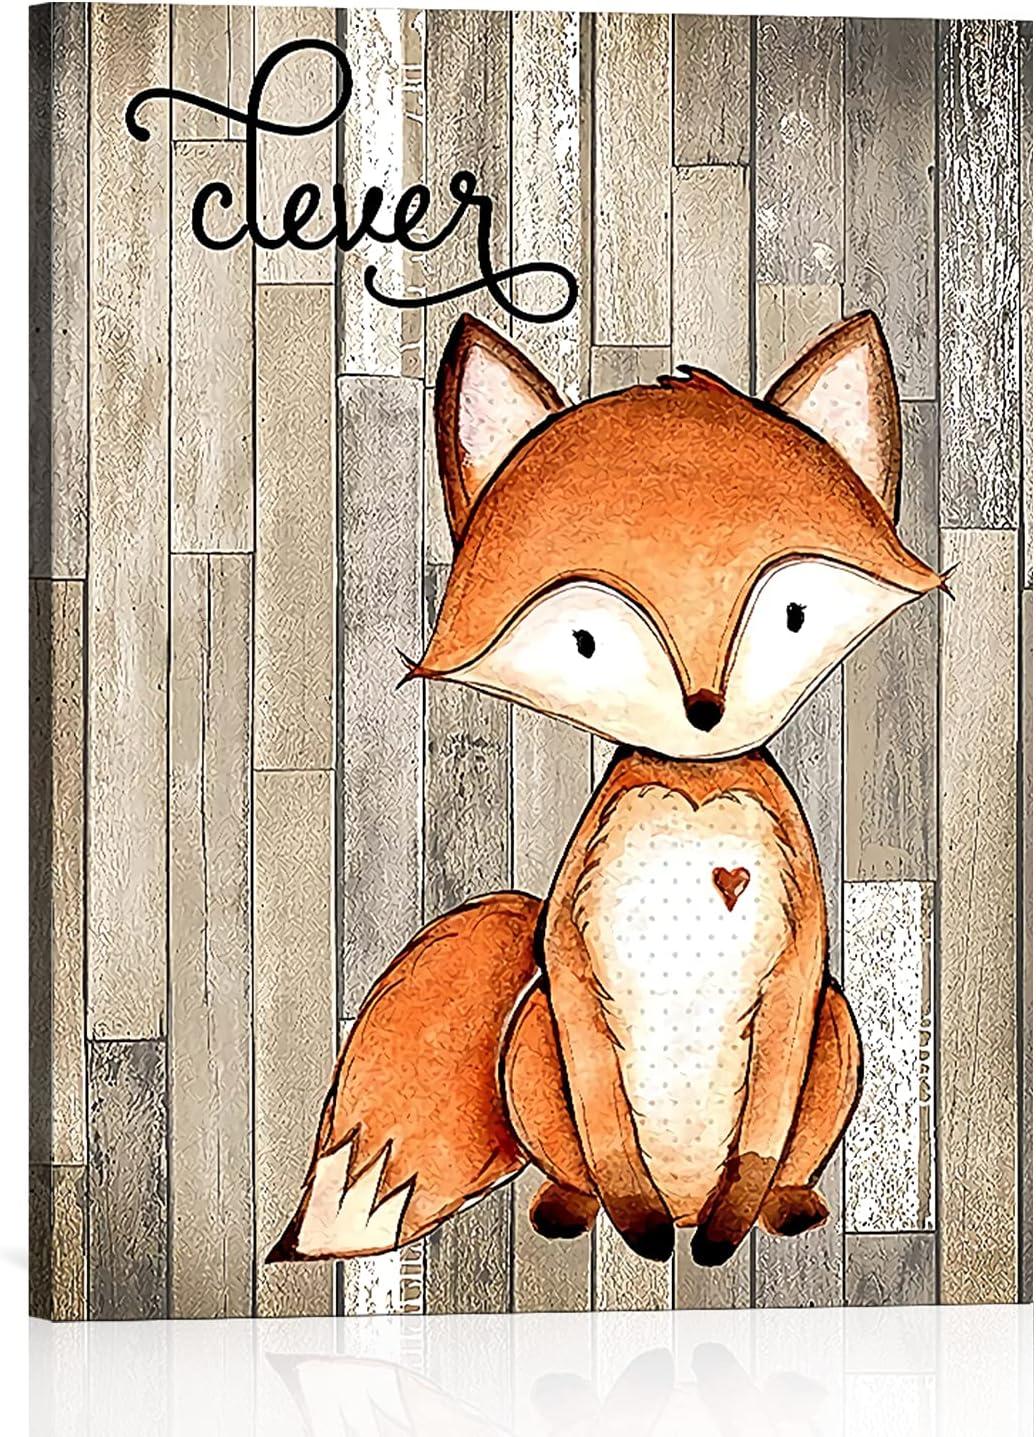 Woodland Animal Nursery Art Print, Adorable Fox Canvas Wall Art Painting, Modern Rustic Farmhouse Decor Ready to Hang, Boys Room Decorations for Bedroom (Unframed, 12